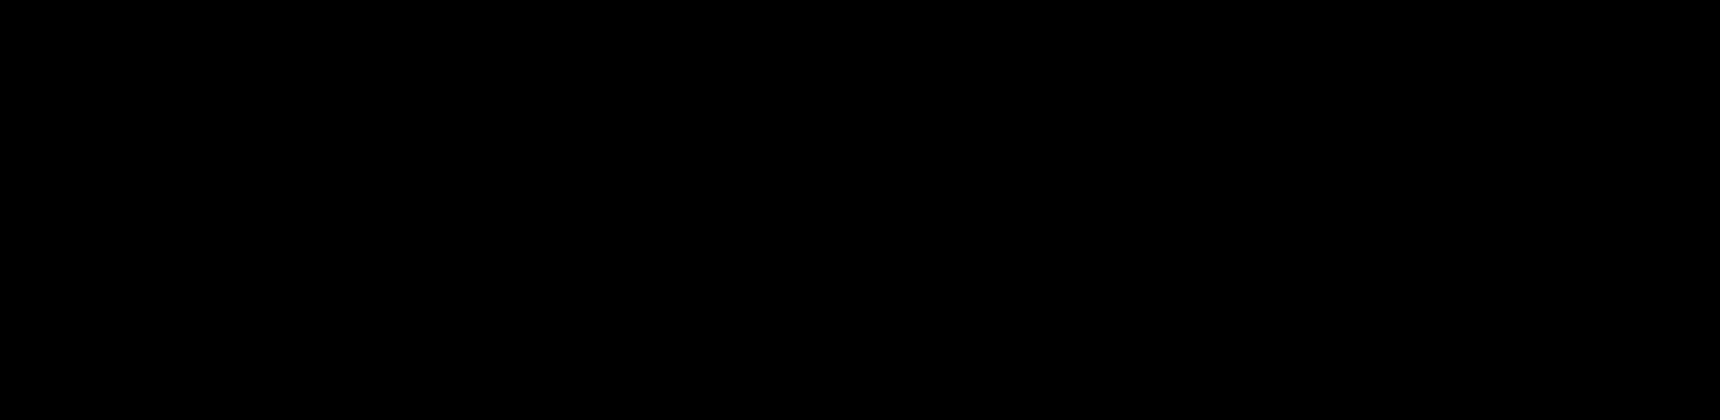 svgexport-1